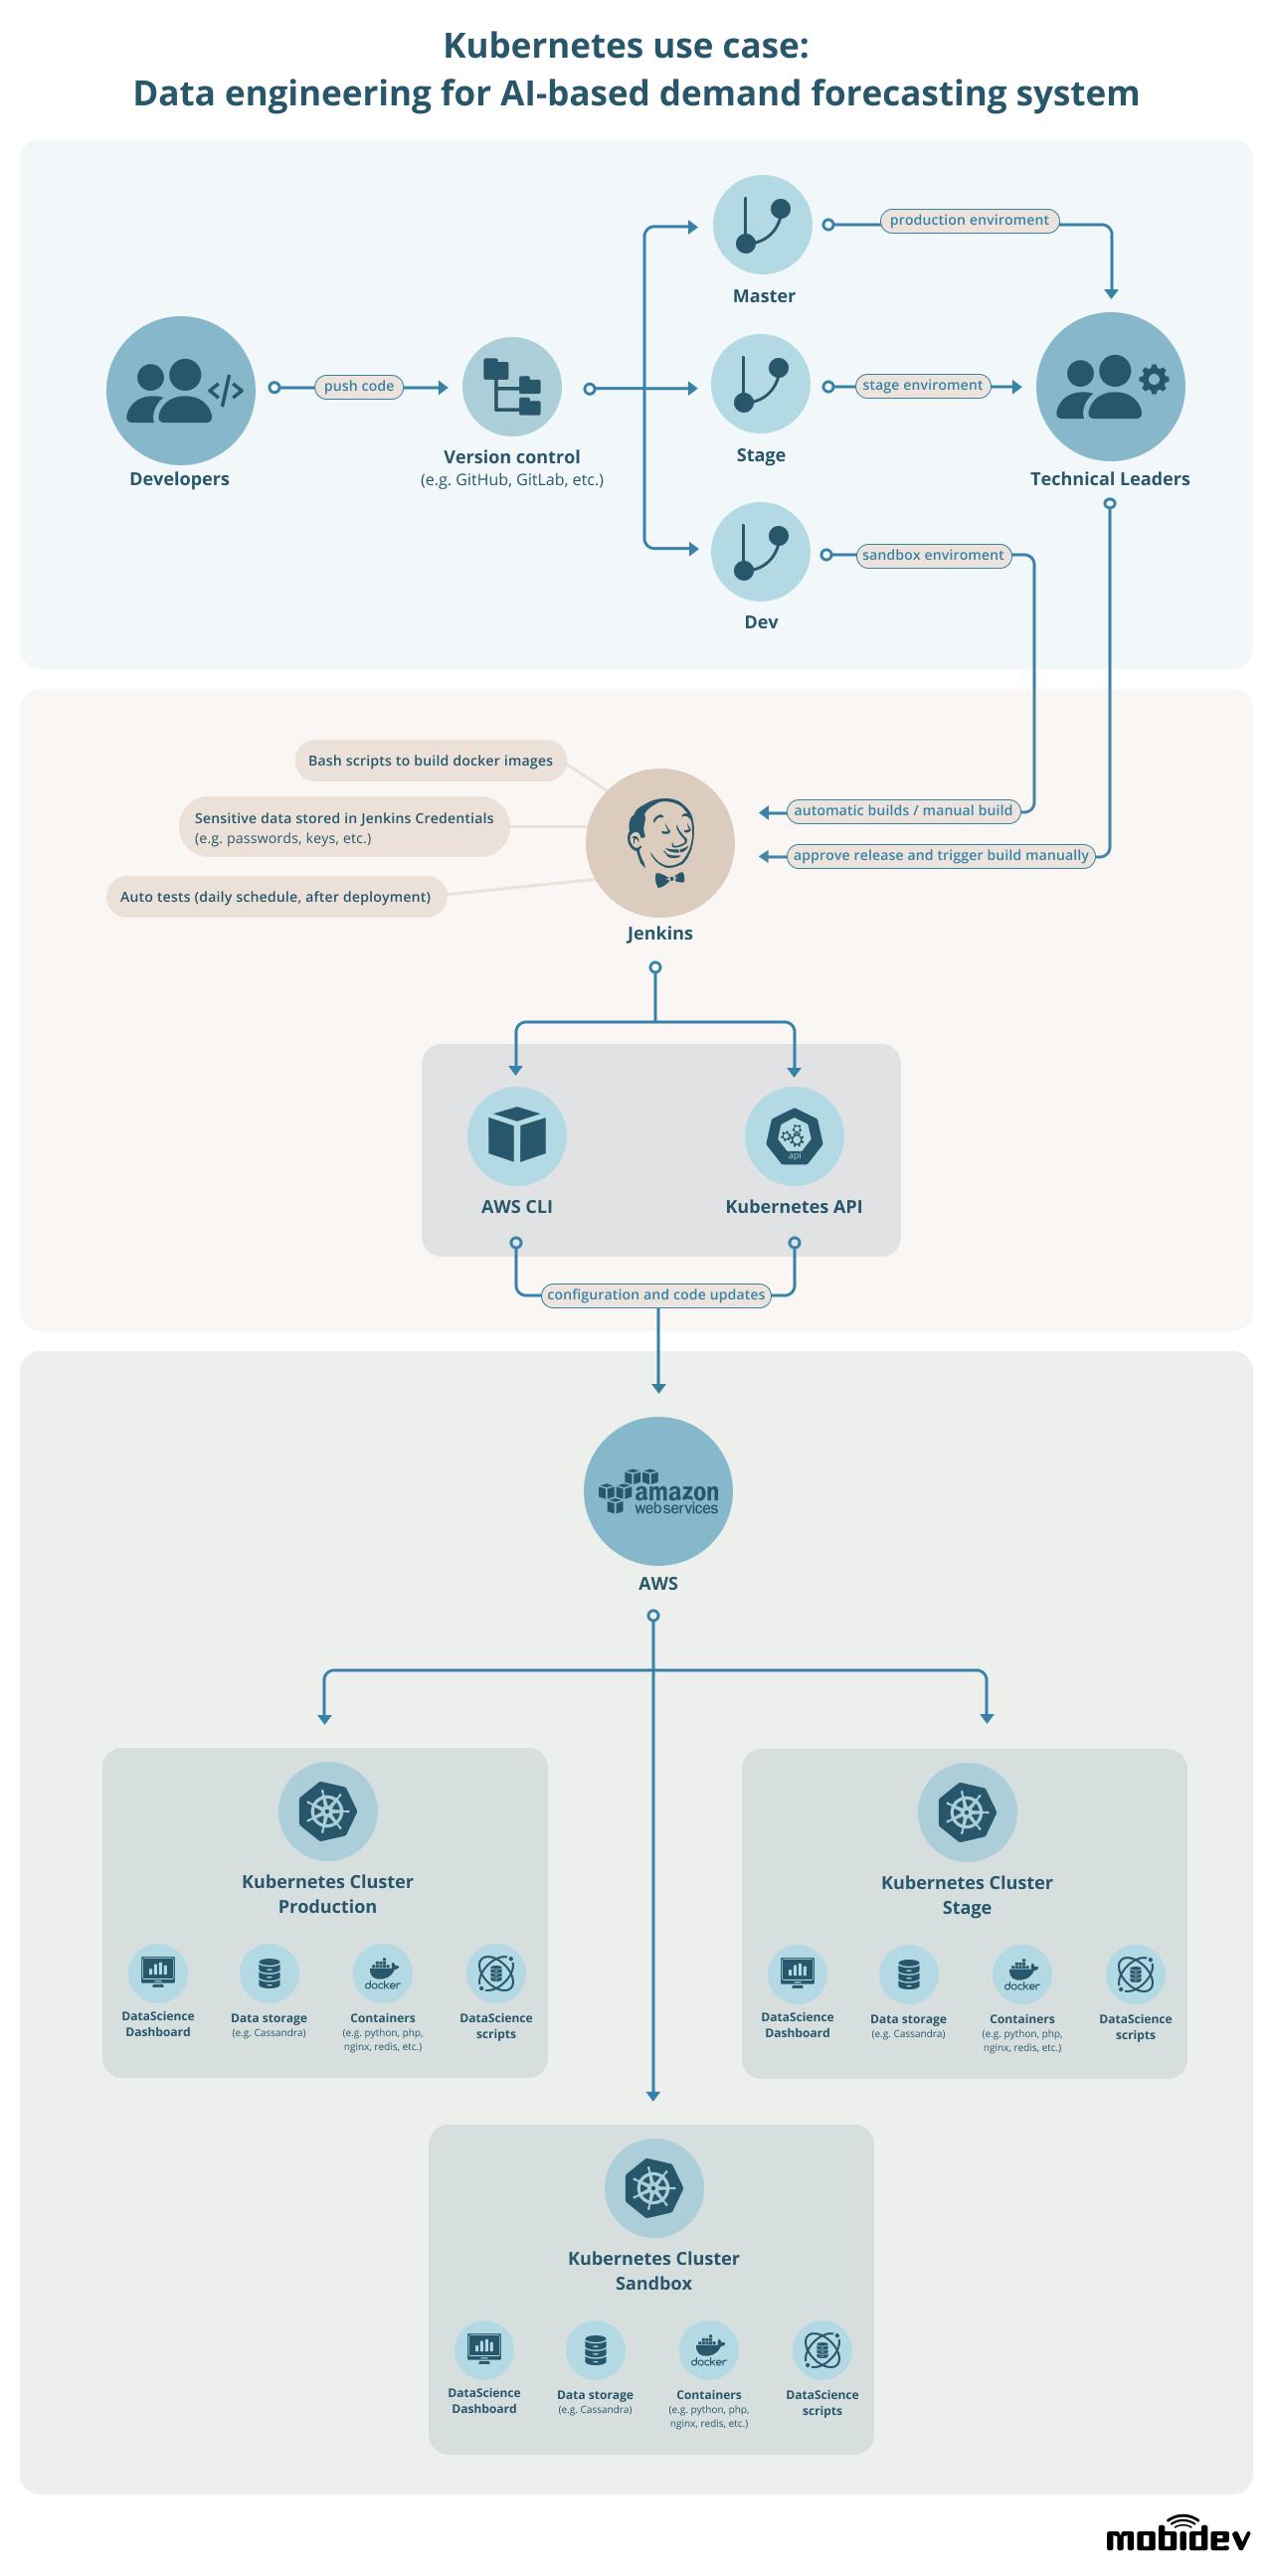 Mobidev Infographic: Kubernetes Use Case